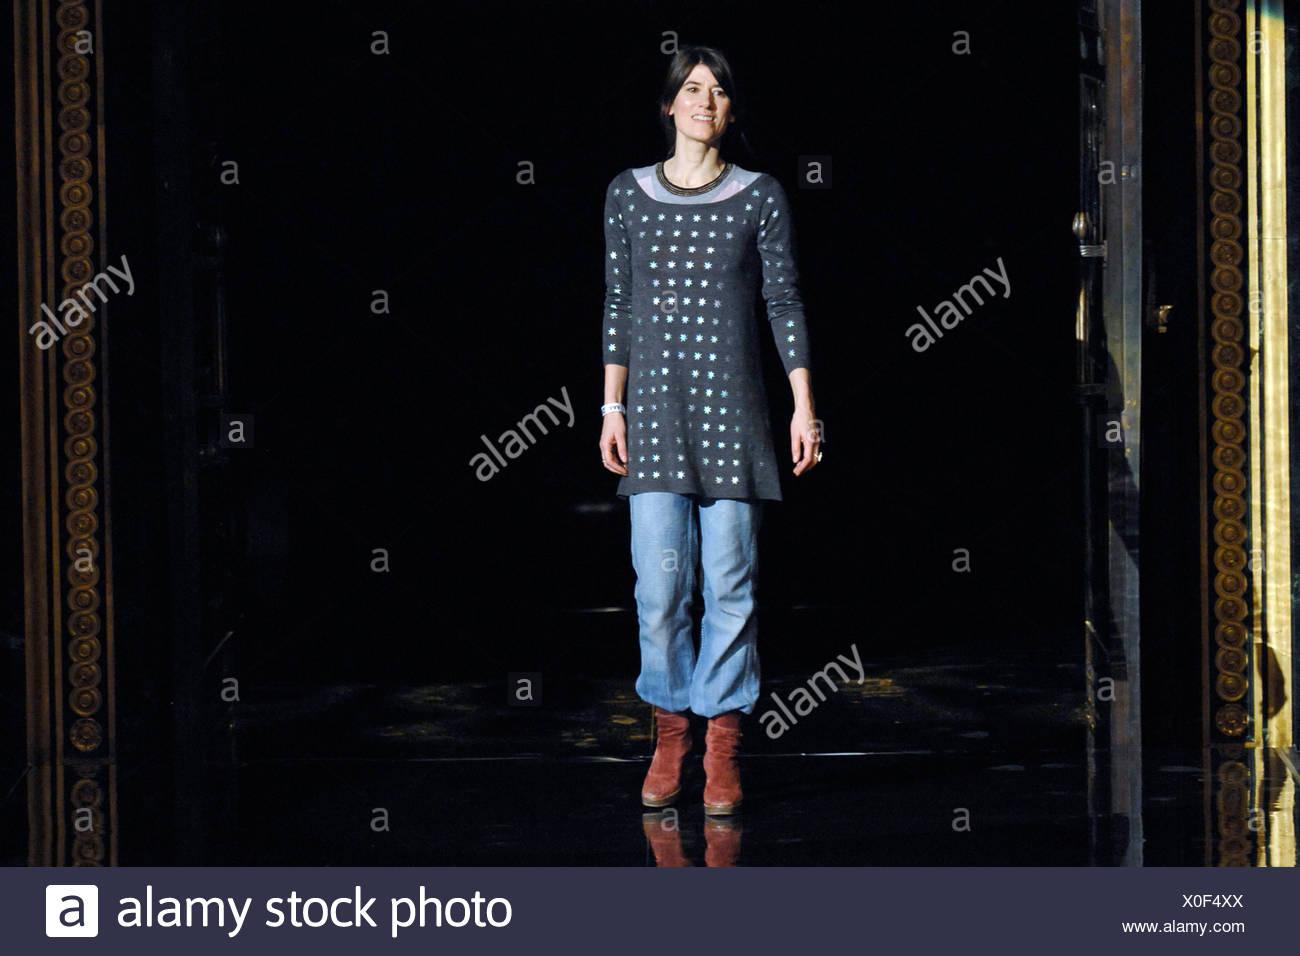 Biba London Ready To Wear Autumn Winter Fashion Designer Bella Freud Wearing Baggy Blue Jeans Long Grey Spotted Tunic Top Red Stock Photo Alamy